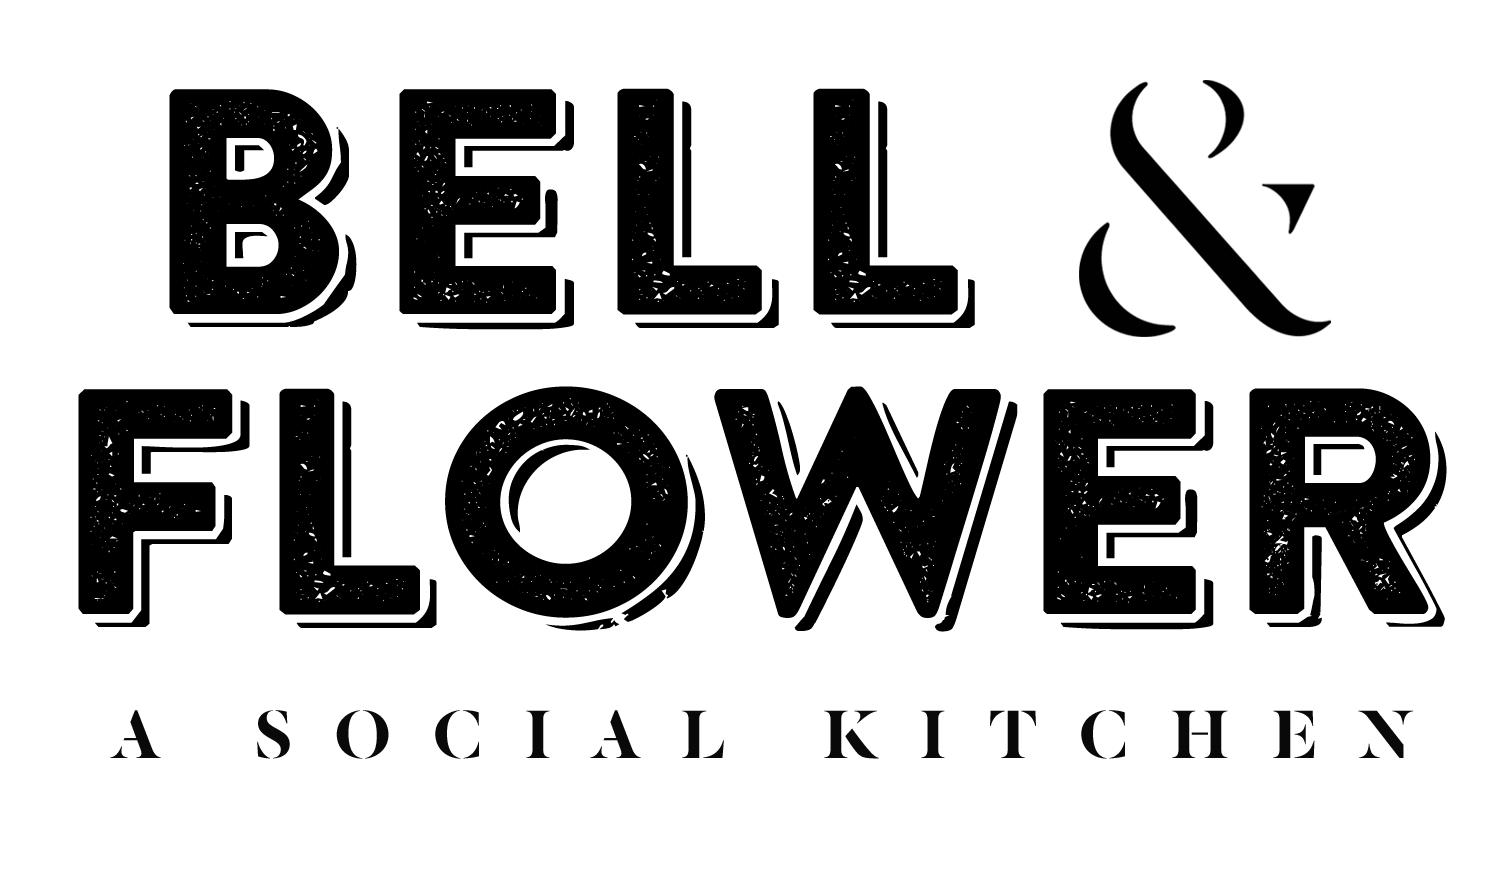 Bell & Flower Kitchen-Chagrin Falls